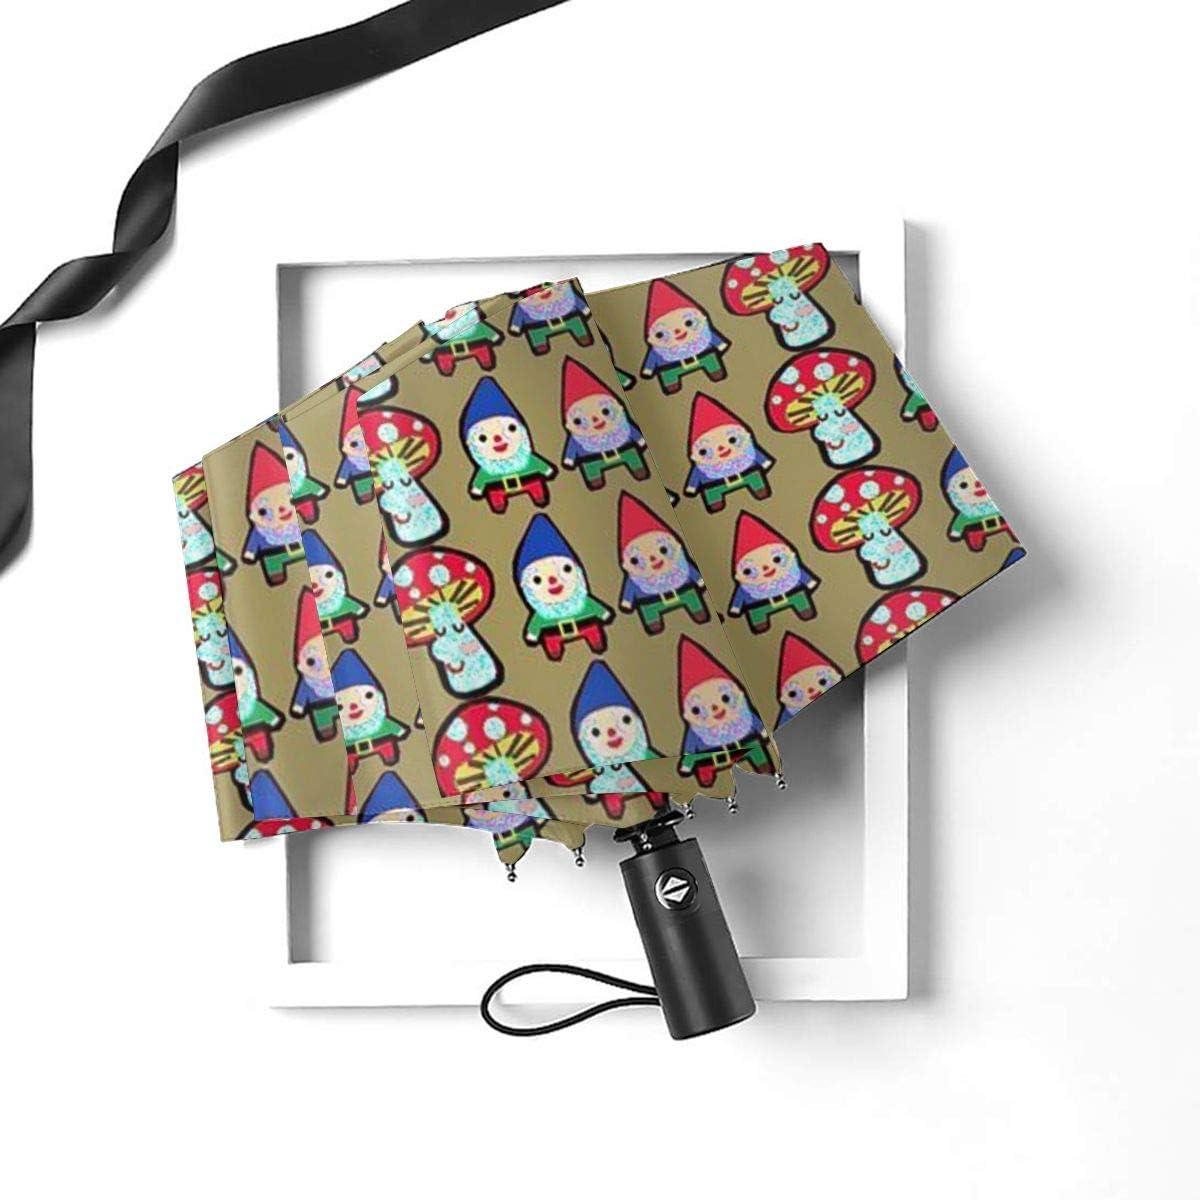 Gnome Mushroom Mash Umbrella Compact Rain/&Wind Repellent Umbrellas Sun Protection With Anti UV Coating Travel Auto Folding Umbrella